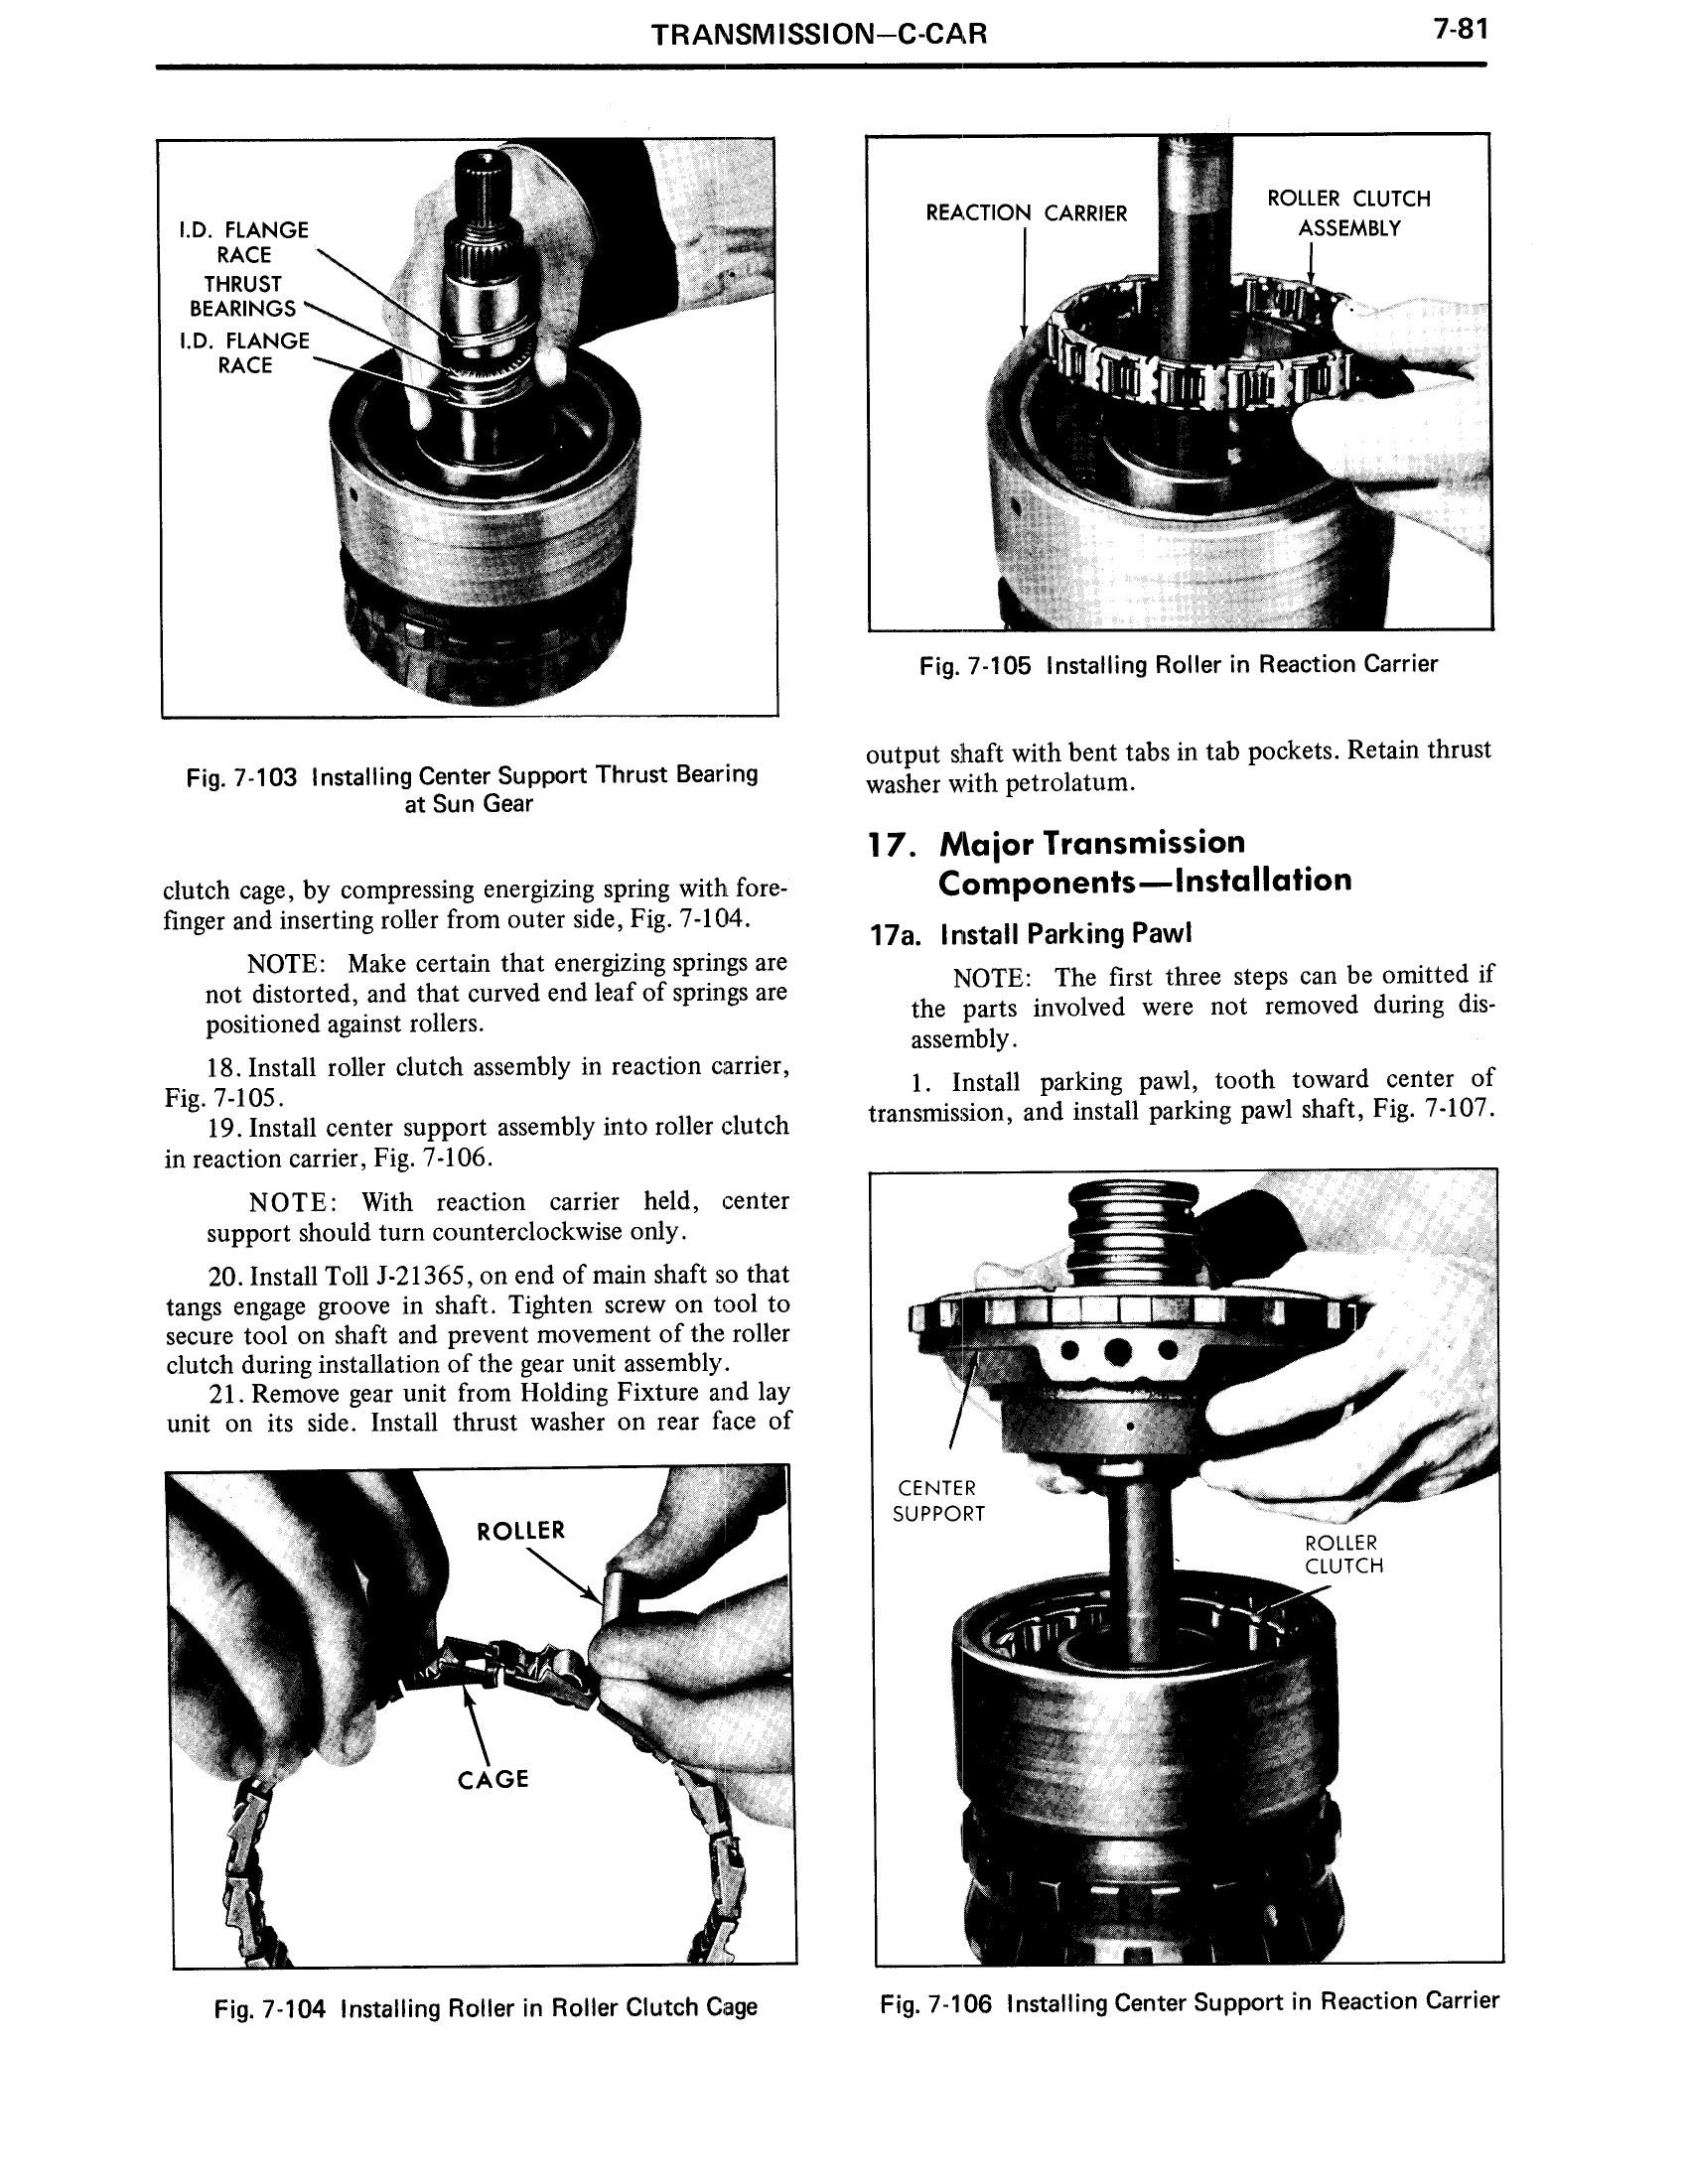 1971 Cadillac Shop Manual- Transmission Page 81 of 156